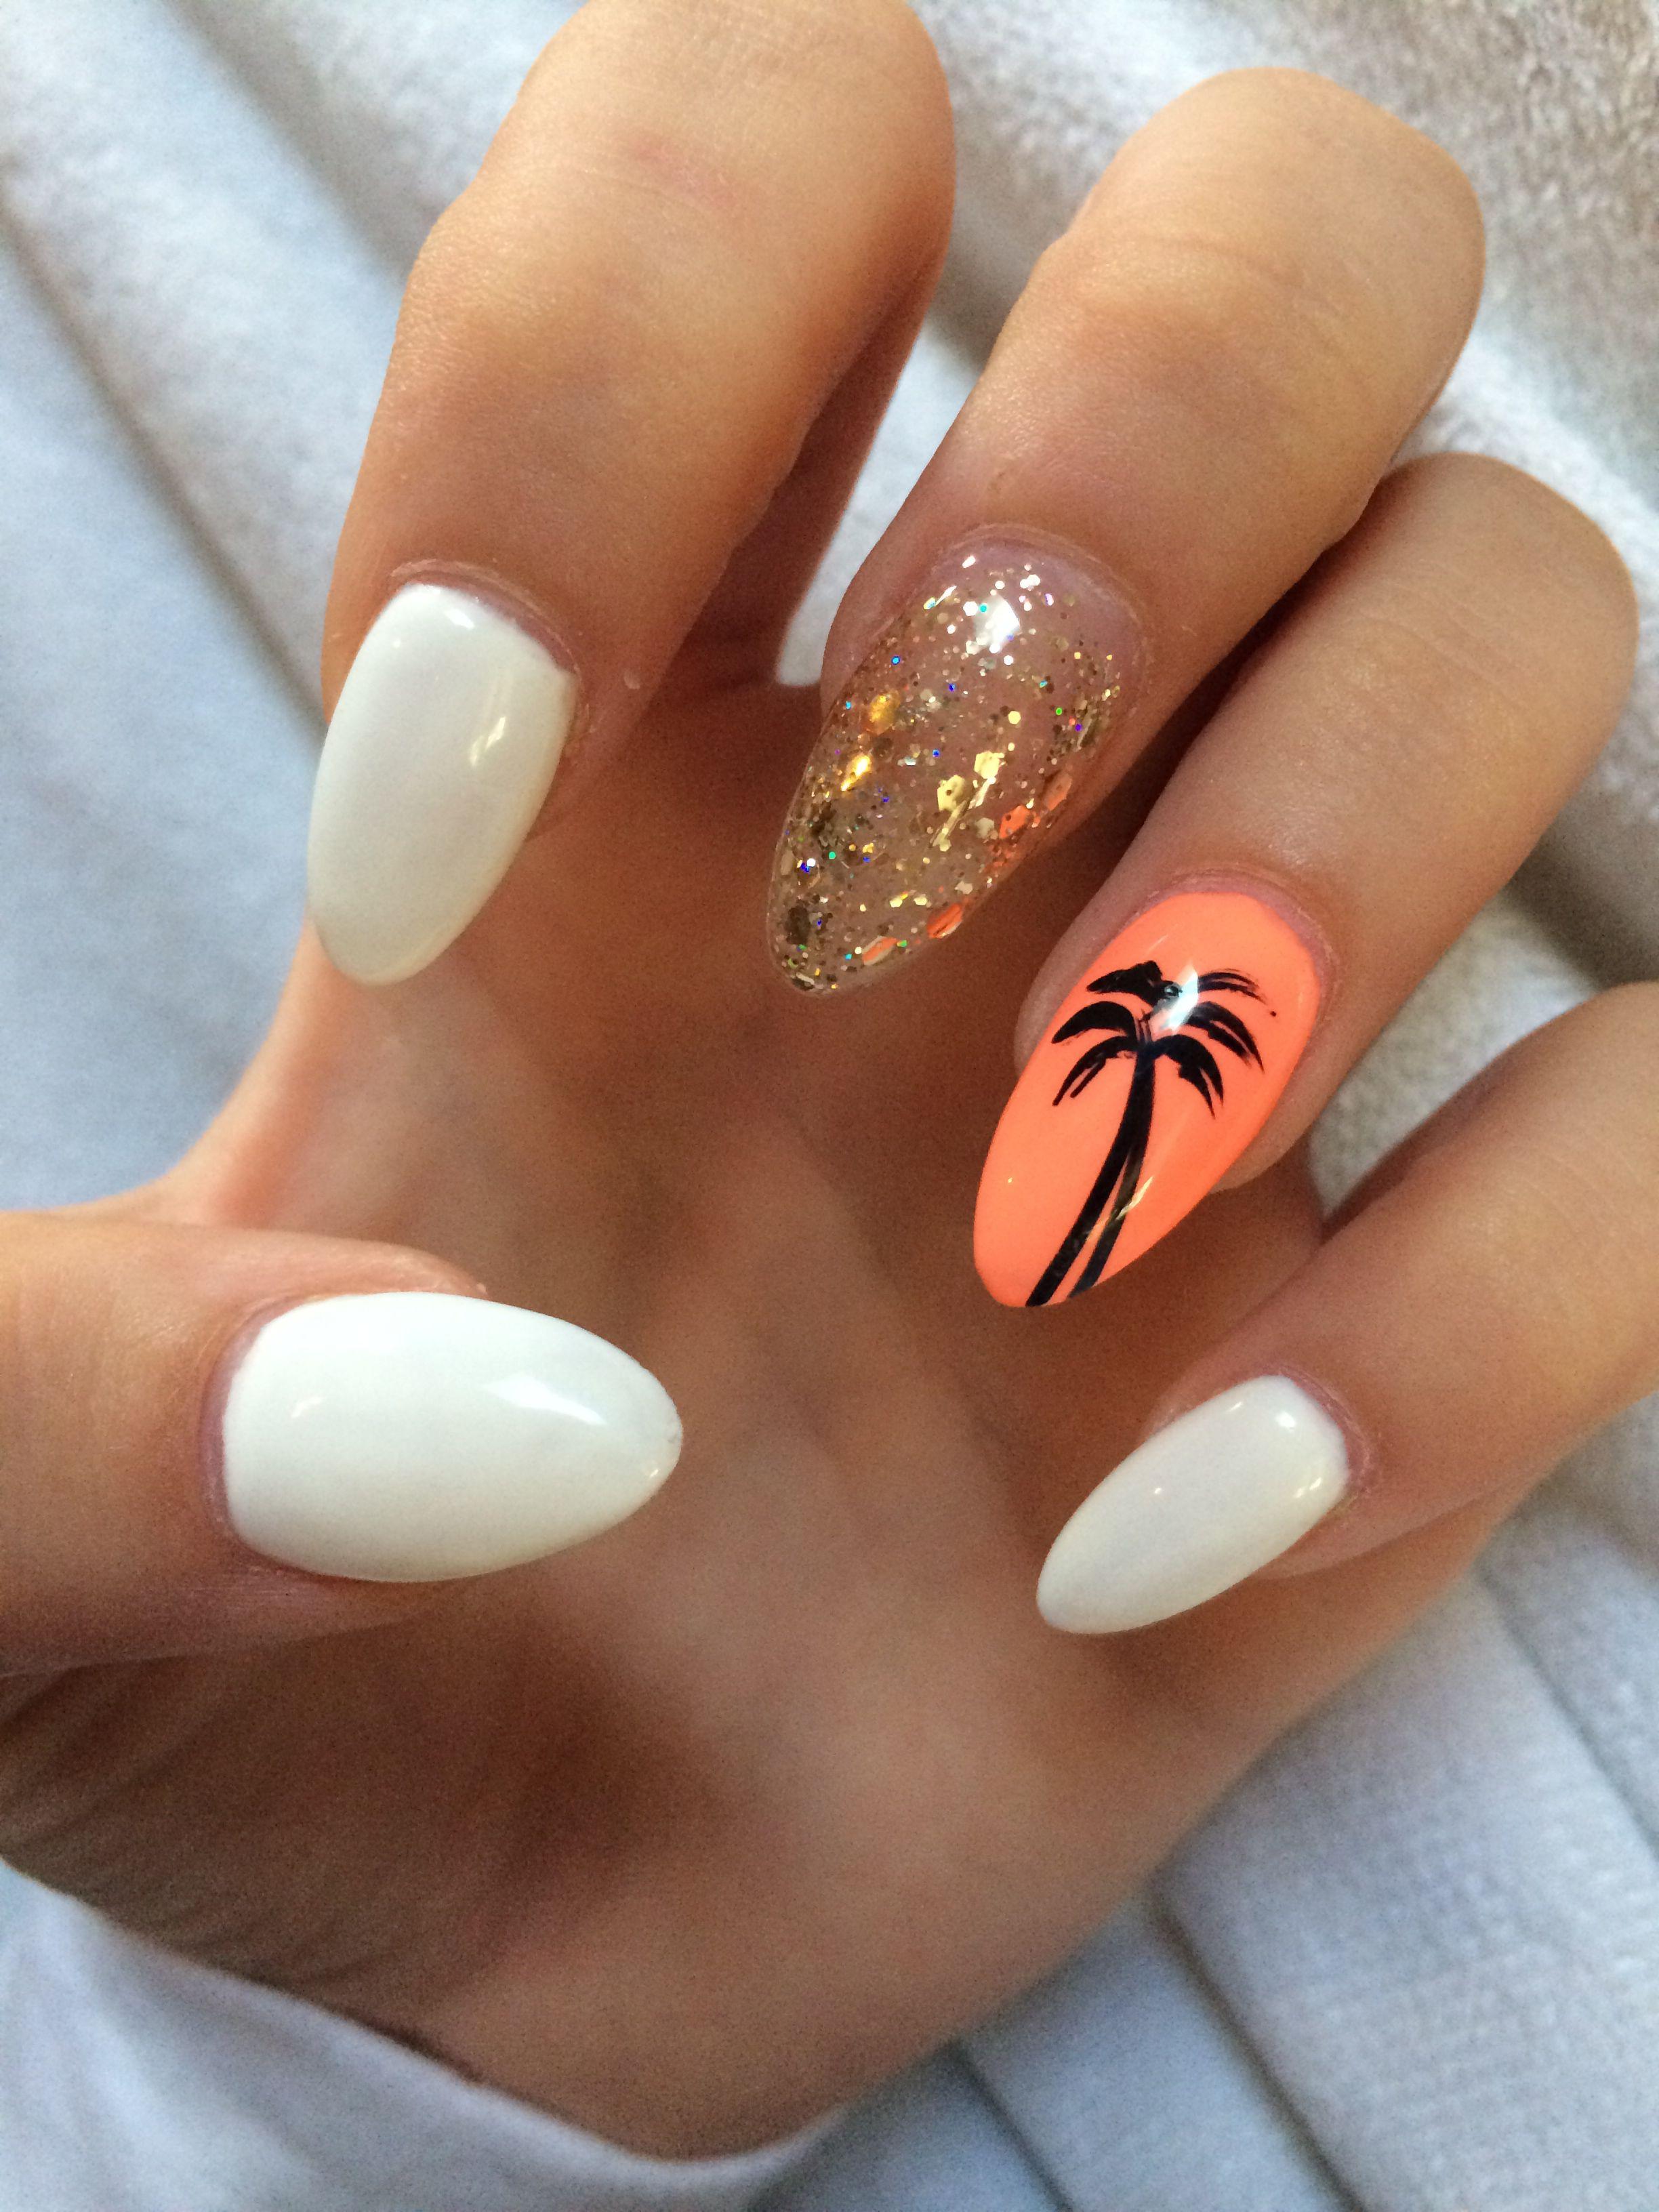 Vacation nails loveeee Pinterest Vacation nails